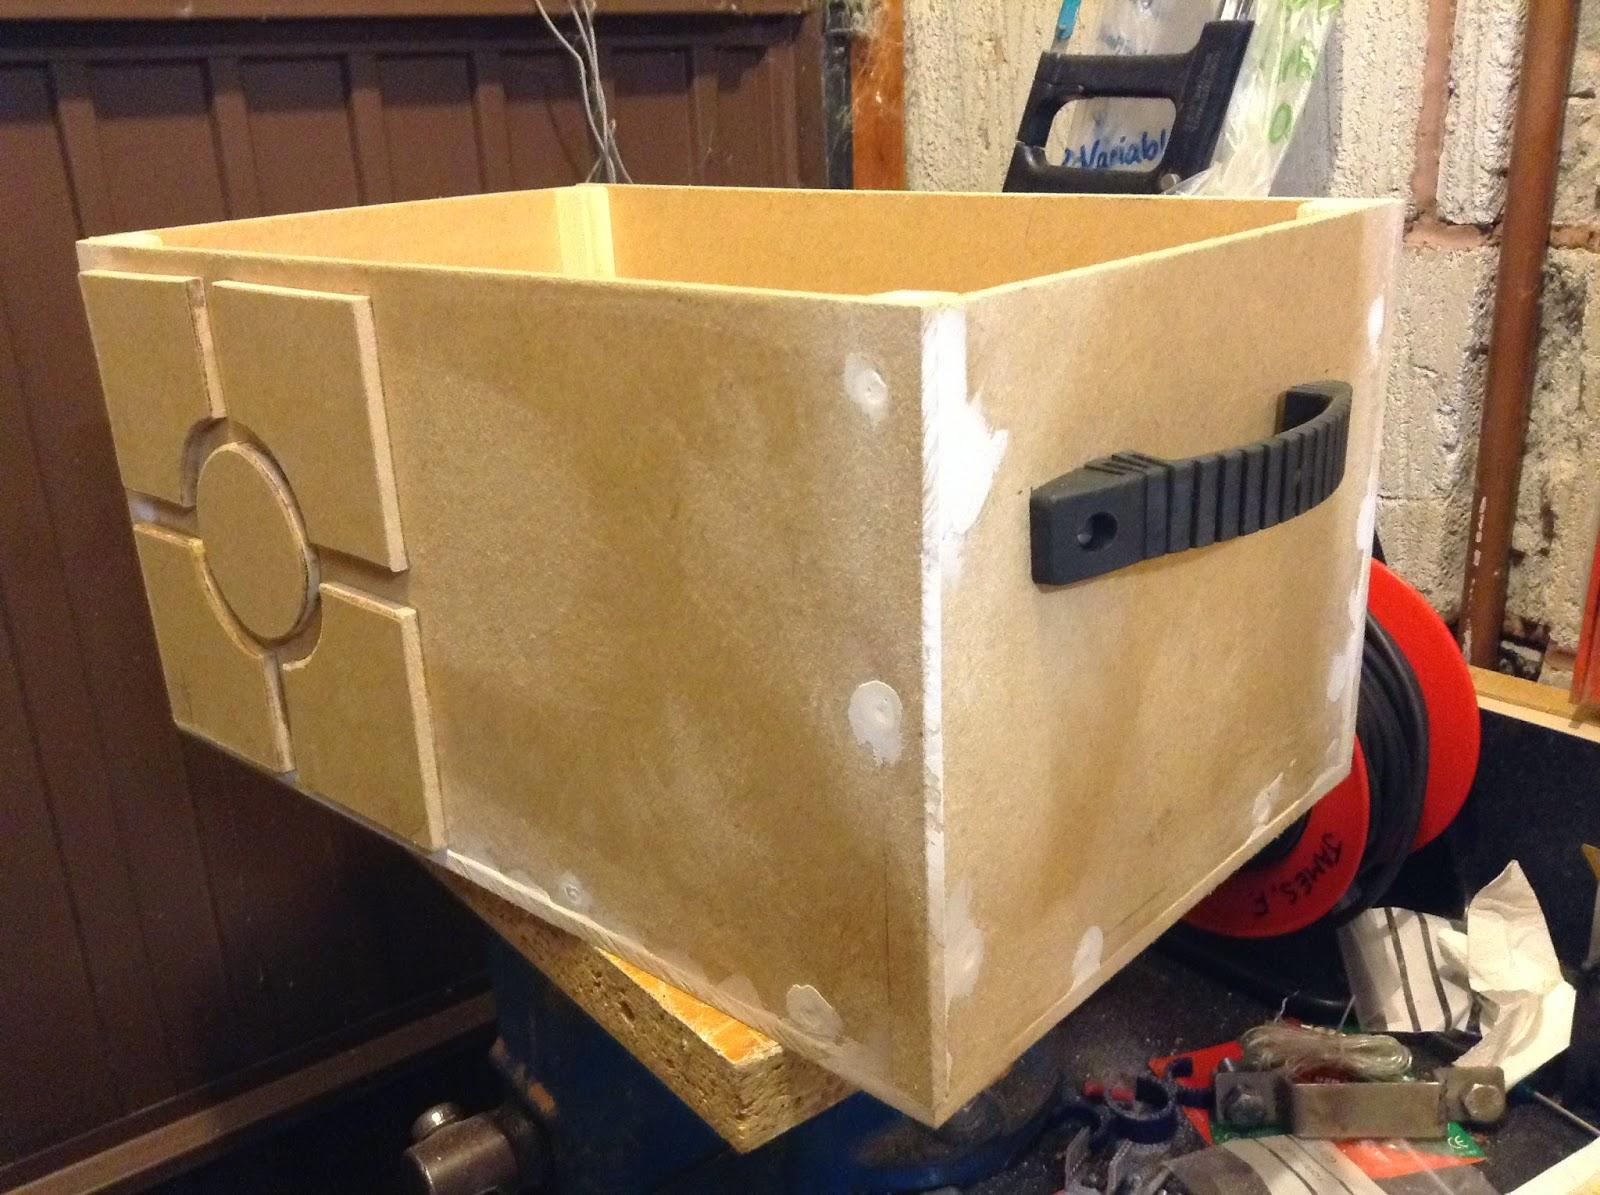 Star Wars container box scanner crew